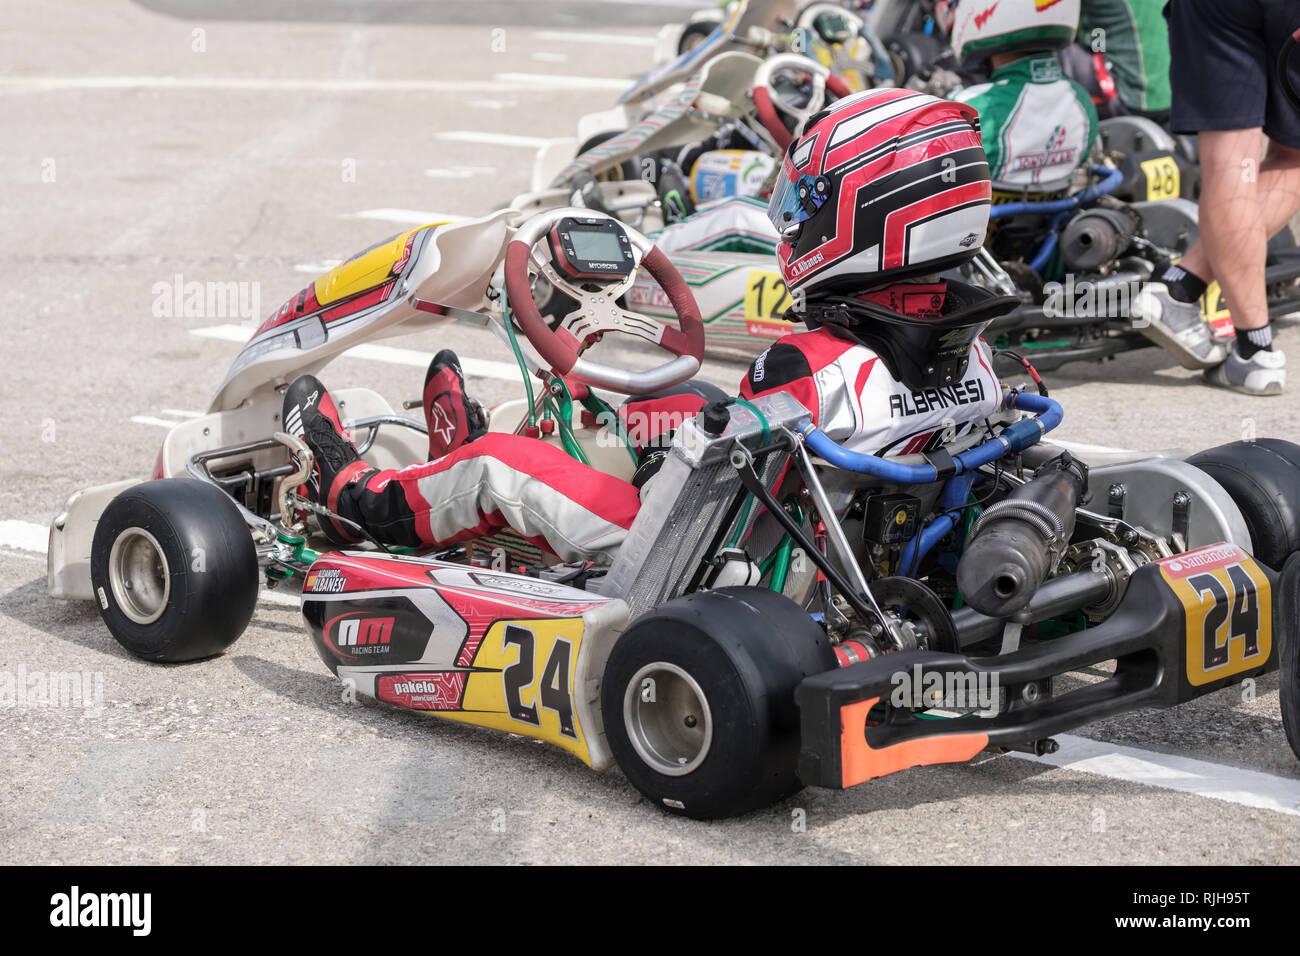 Junge Kartbahnen Treiber im Fahrerlager, Campillos, Malaga, Spanien wartet. Stockbild